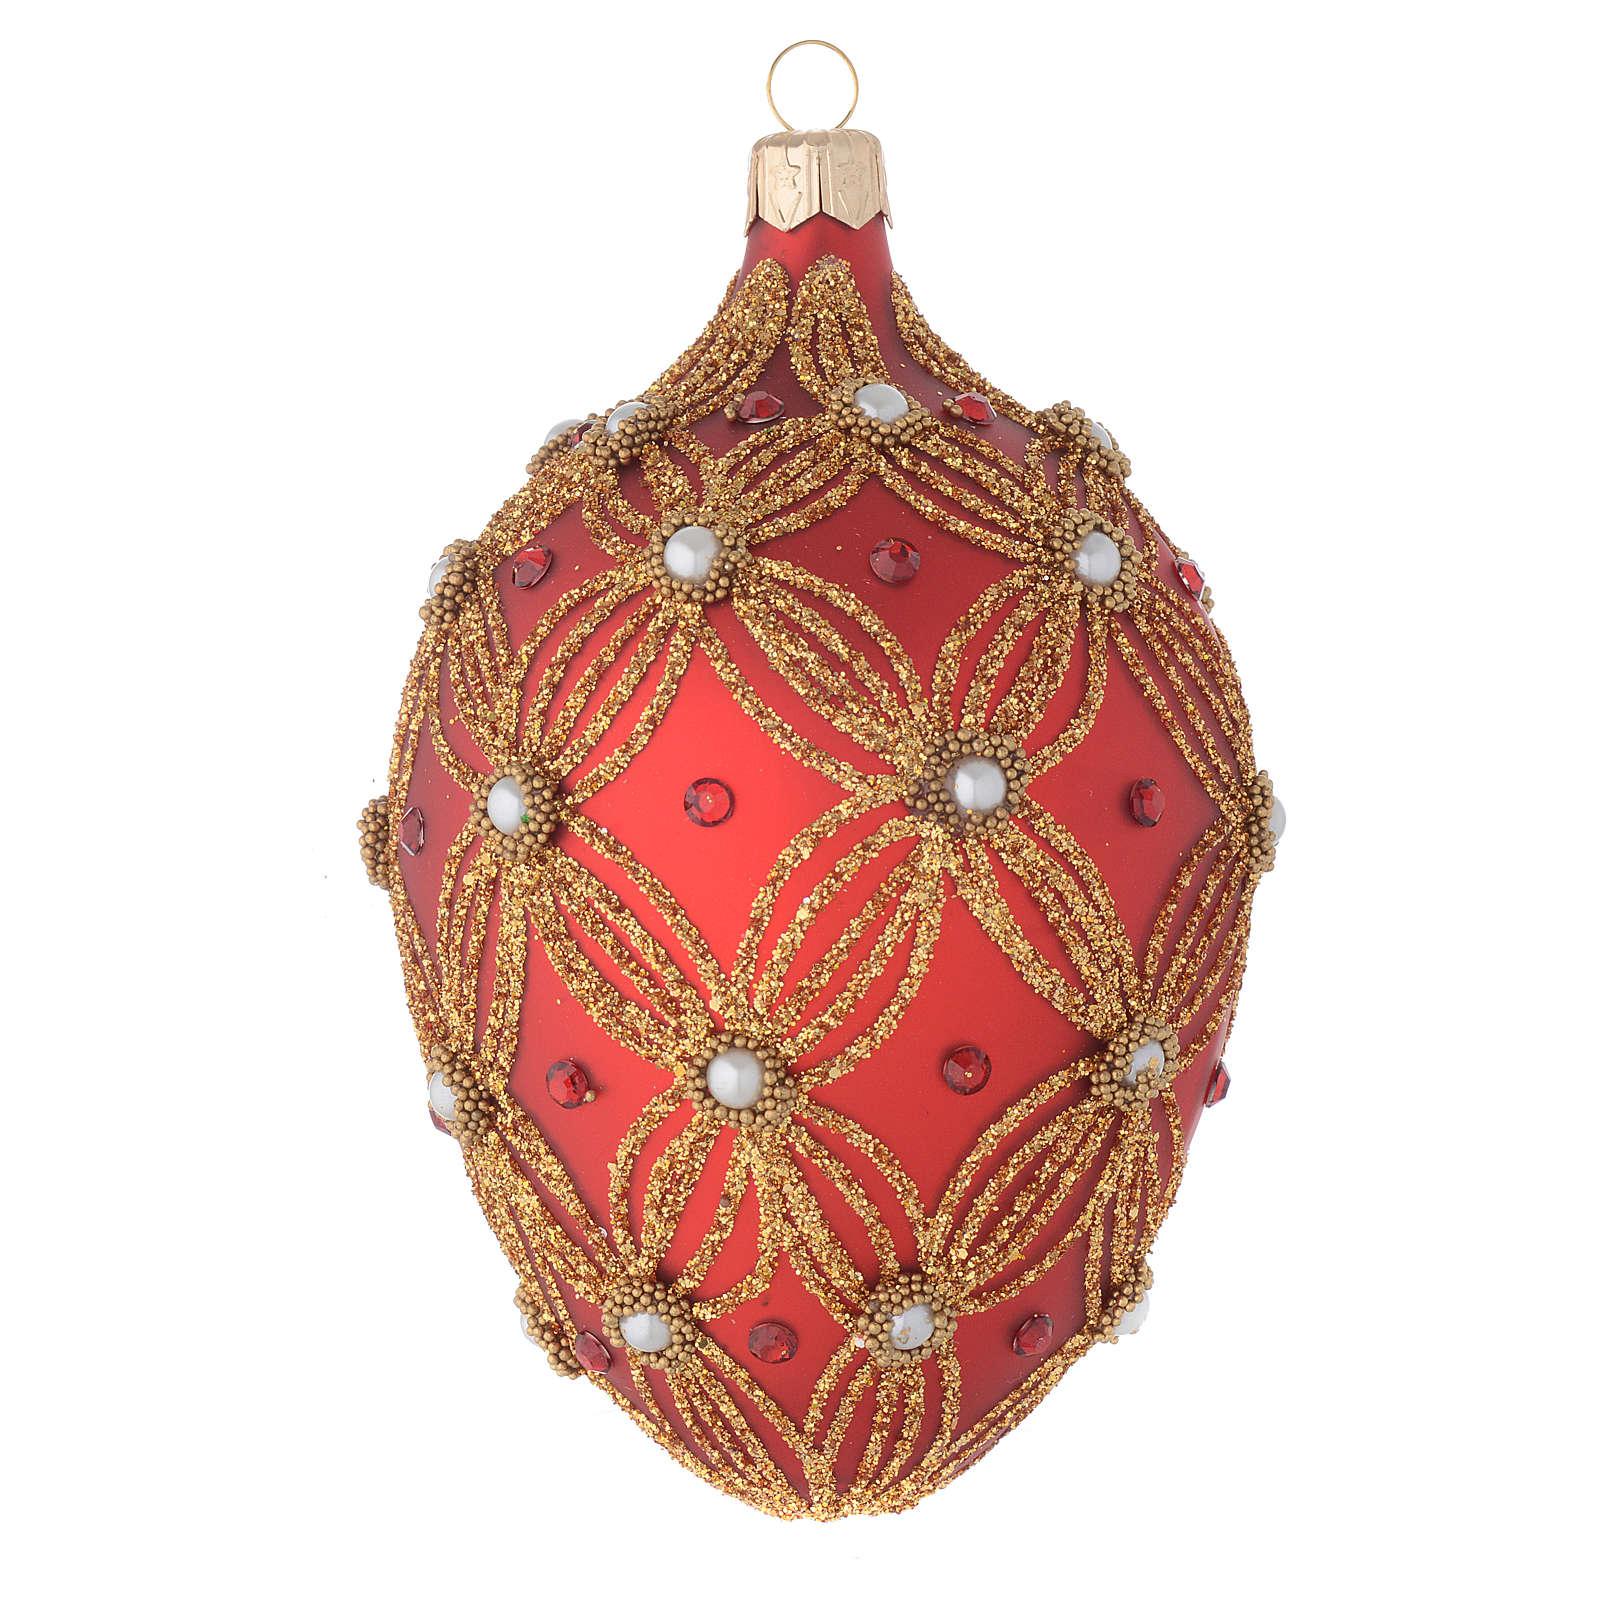 Boule oeuf verre rouge perles et or 130 mm 4